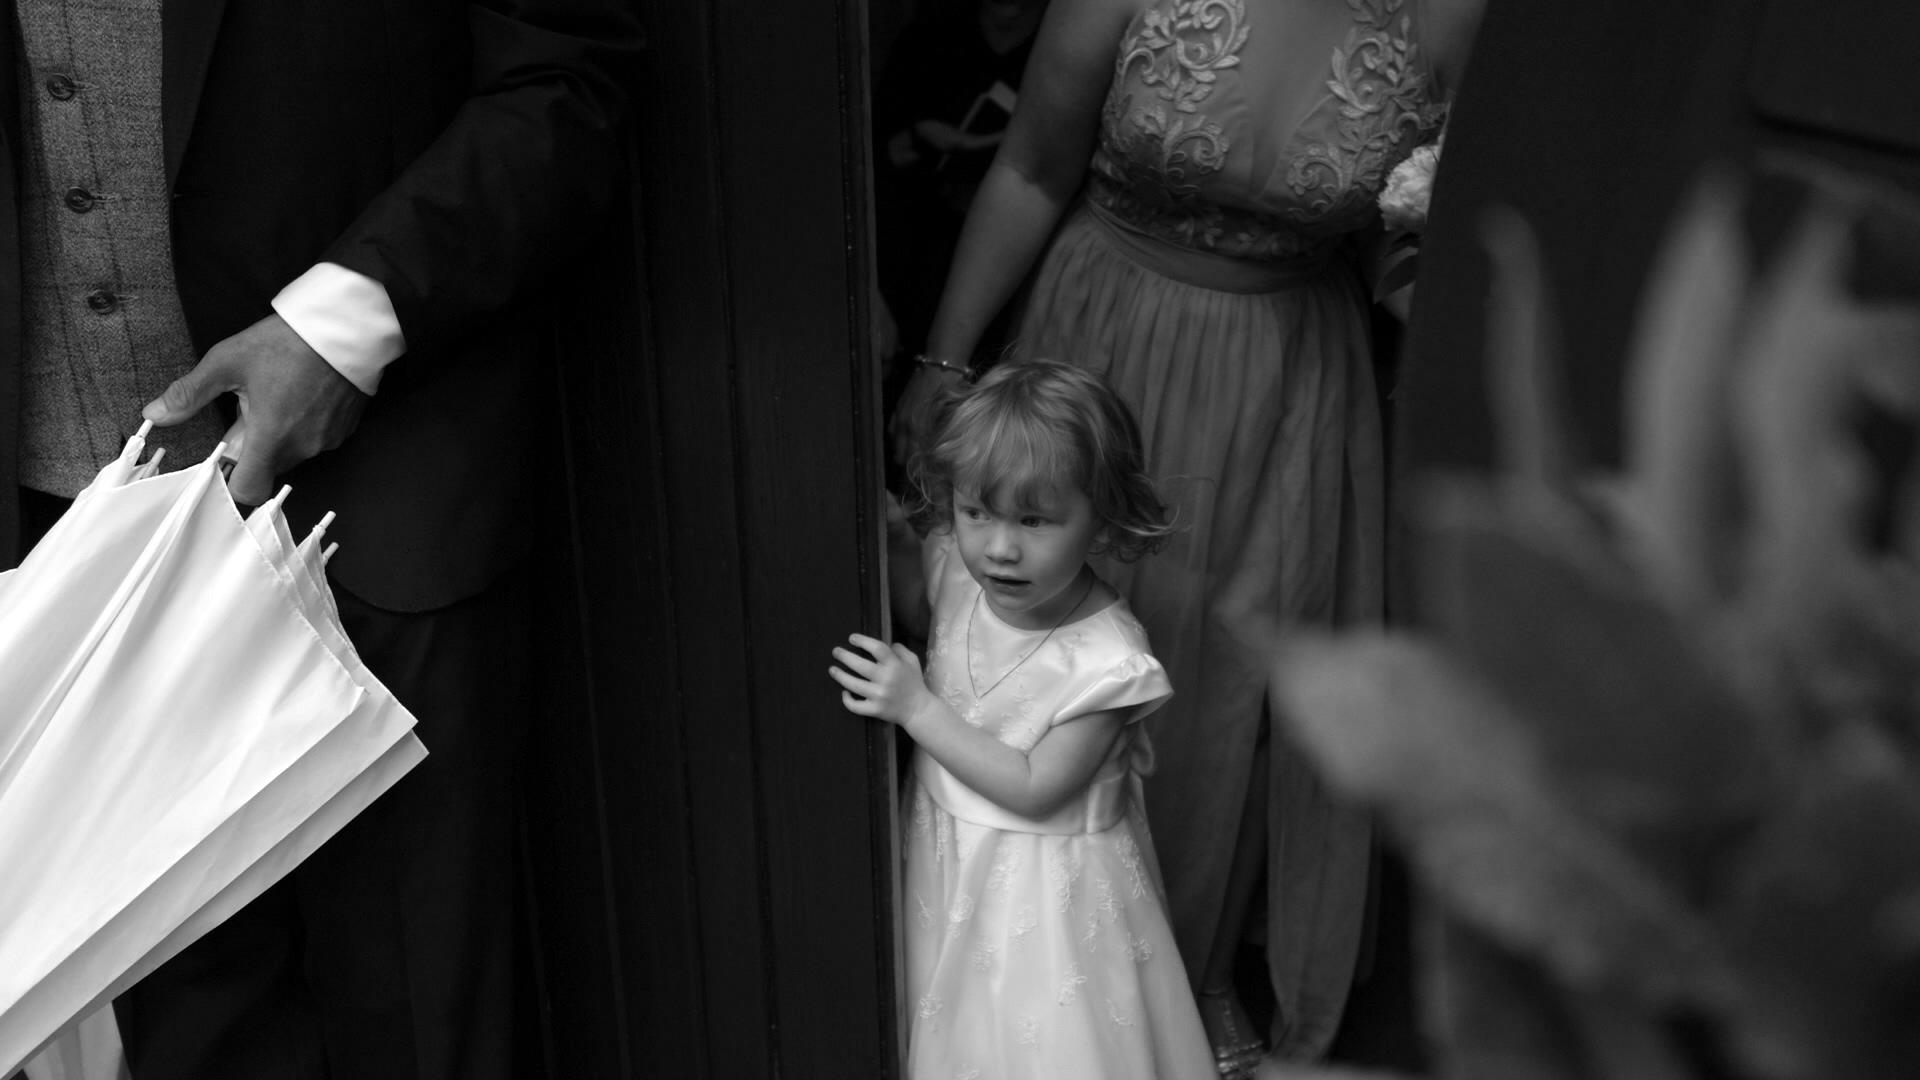 DRUMTOCHTY-SUMMER-WEDDING (07).jpg